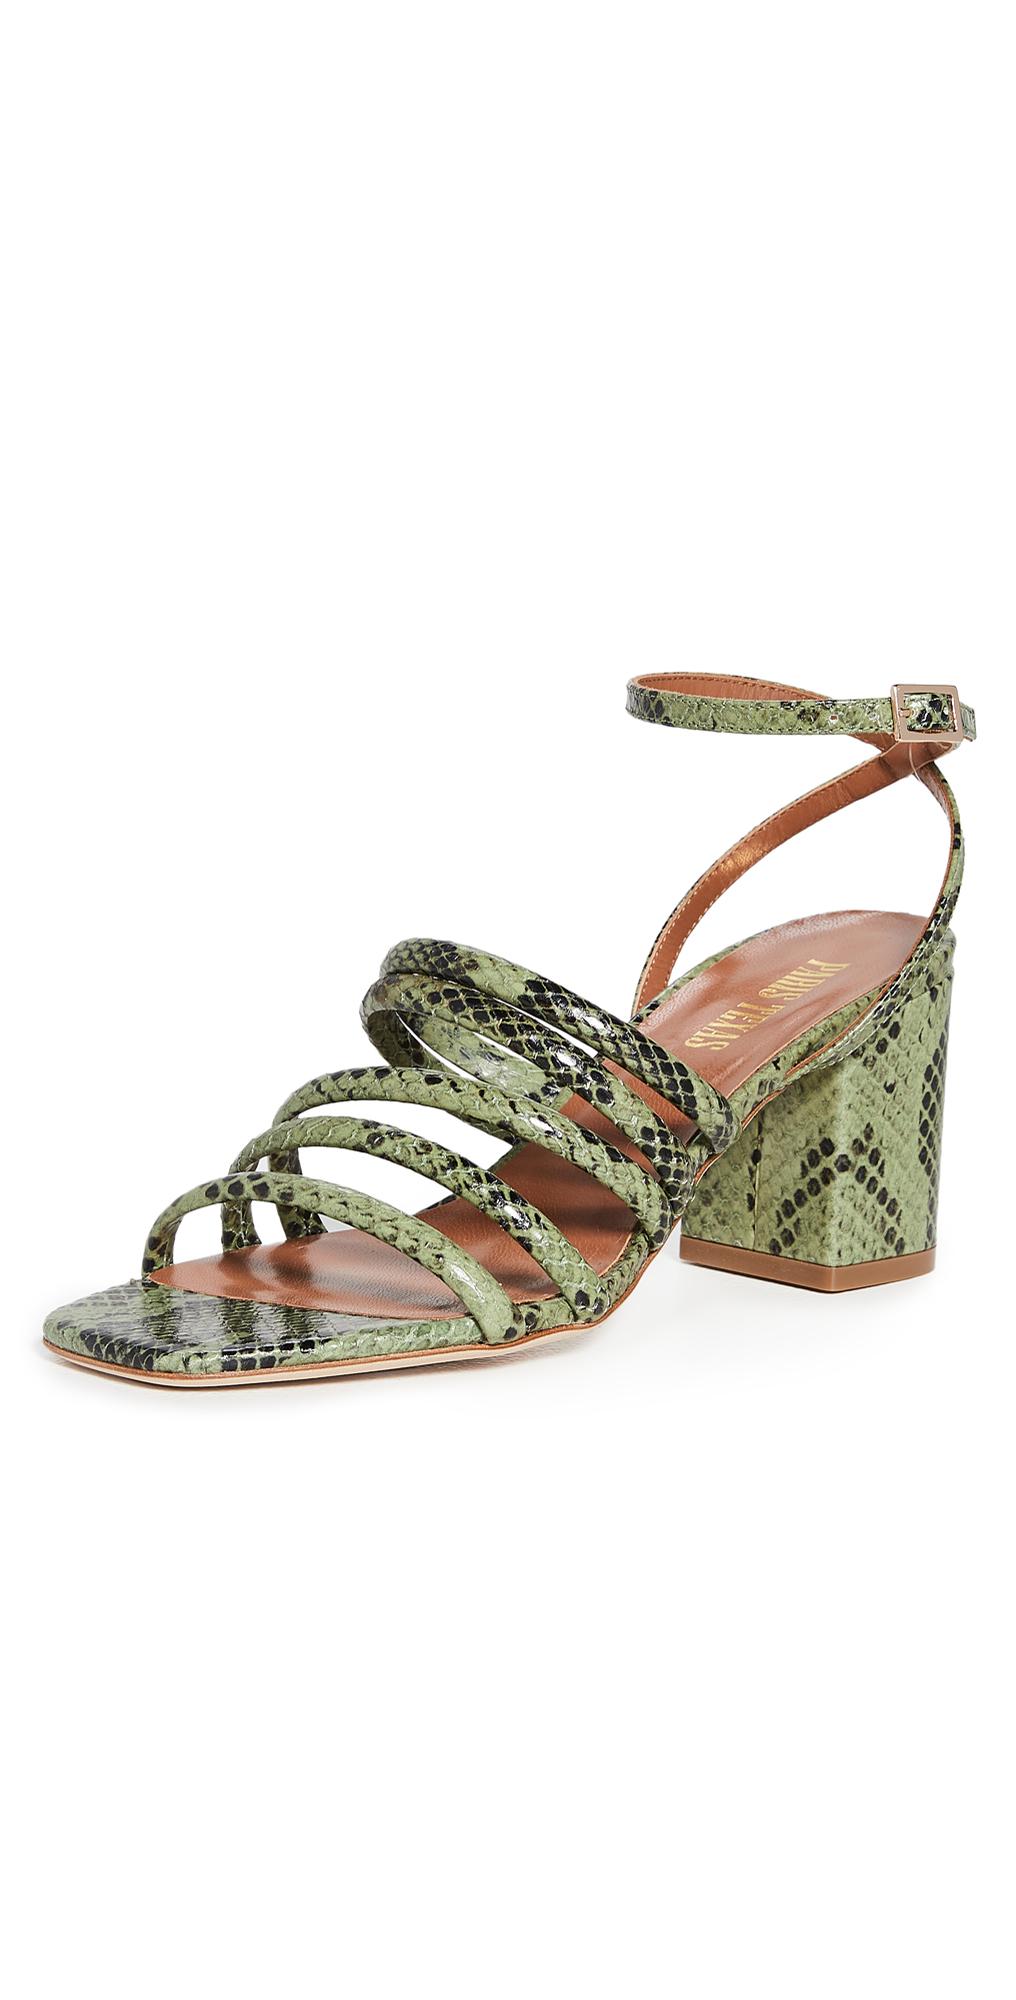 Paris Texas Carla Snake-print Strappy Sandals In Cactus